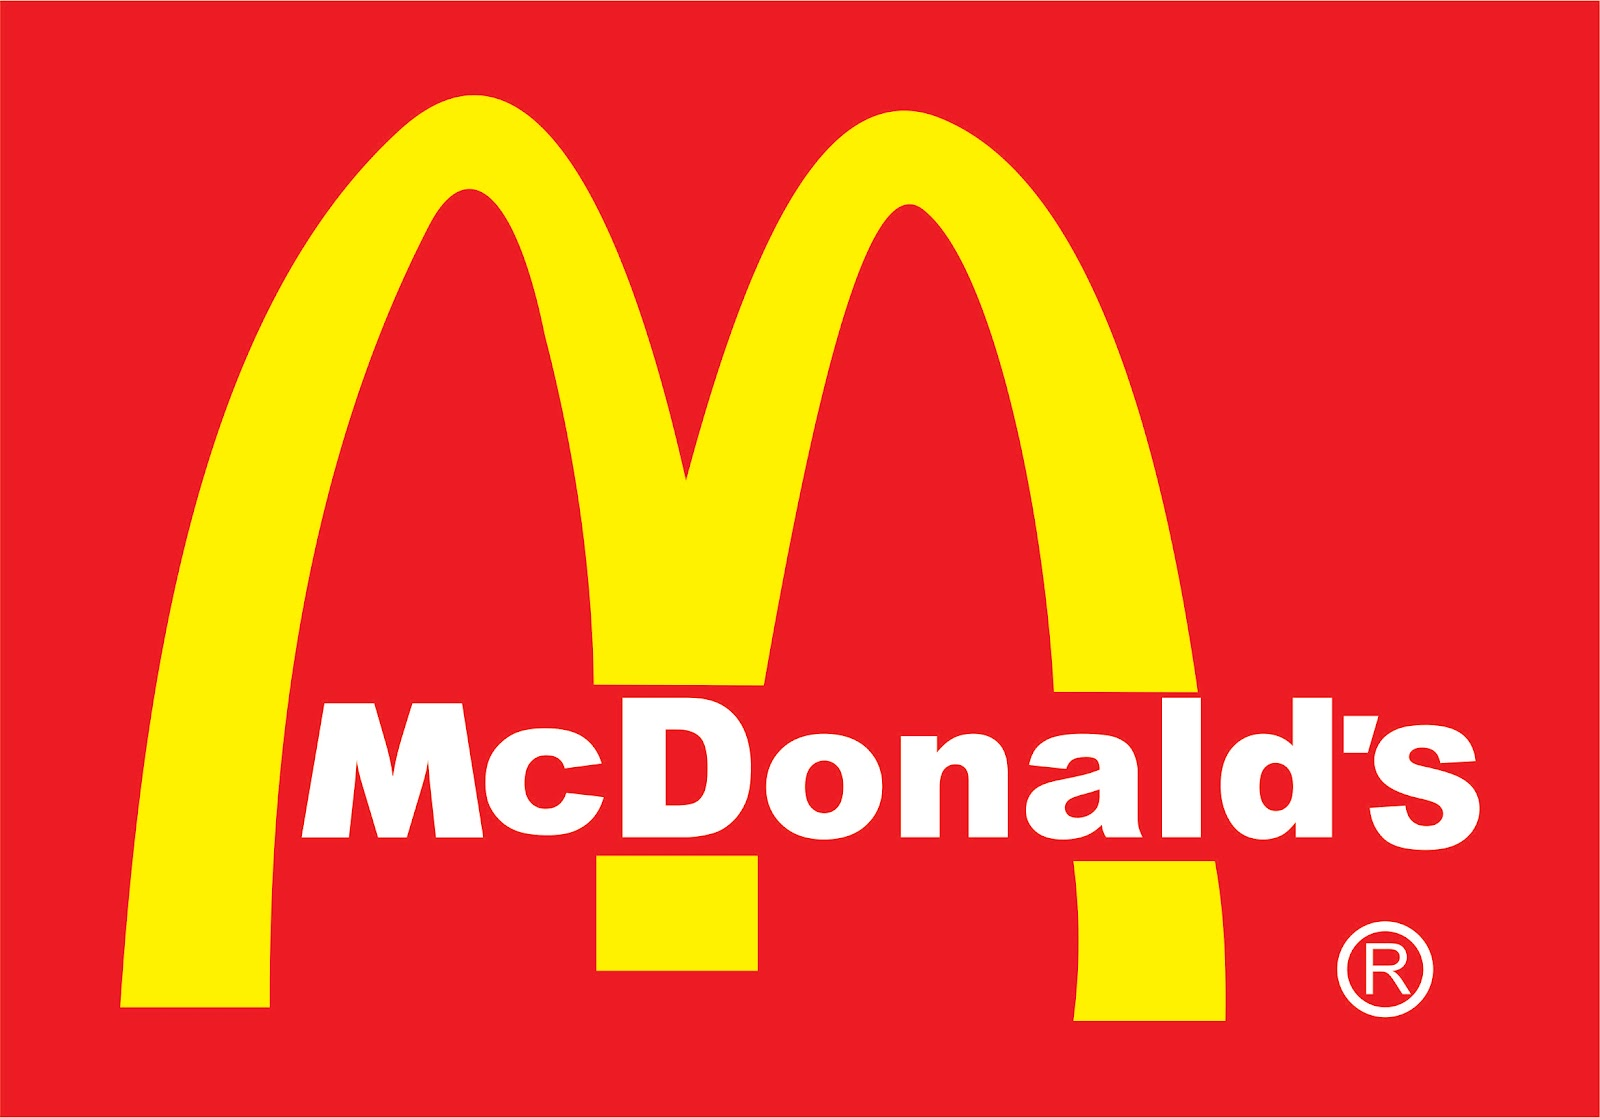 Macdonalds Logo Wallpaper